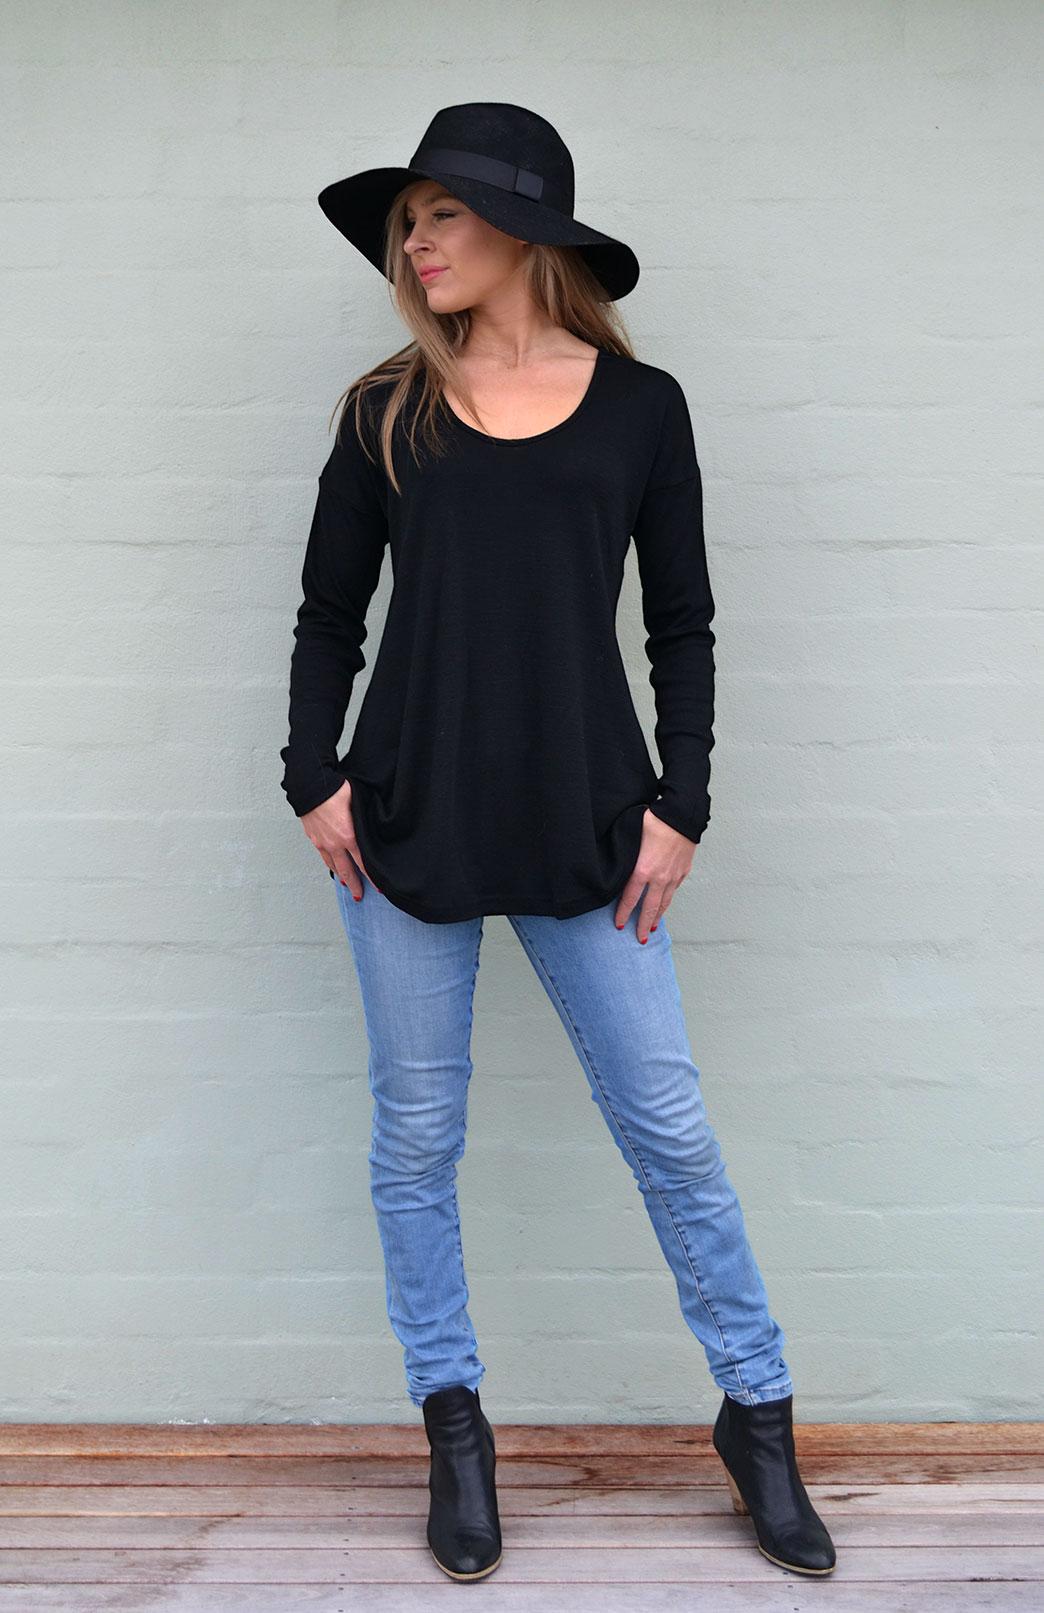 Wave Top - Women's Relaxed Fit Black Wool Top with dropped shoulders - Smitten Merino Tasmania Australia